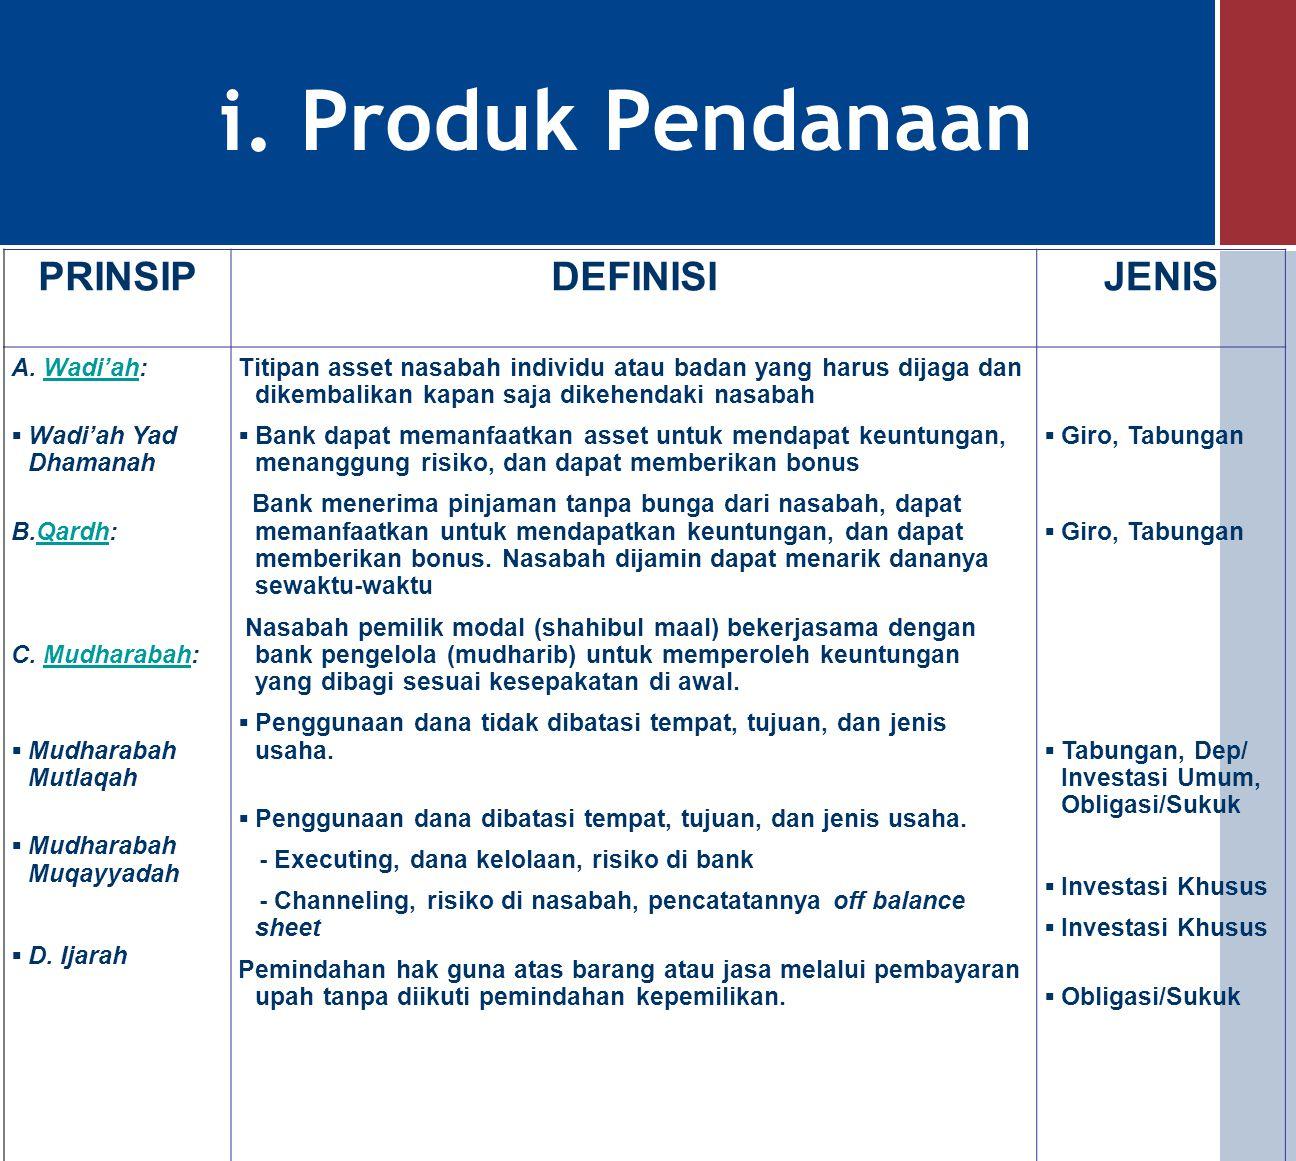 i. Produk Pendanaan PRINSIP DEFINISI JENIS A. Wadi'ah: